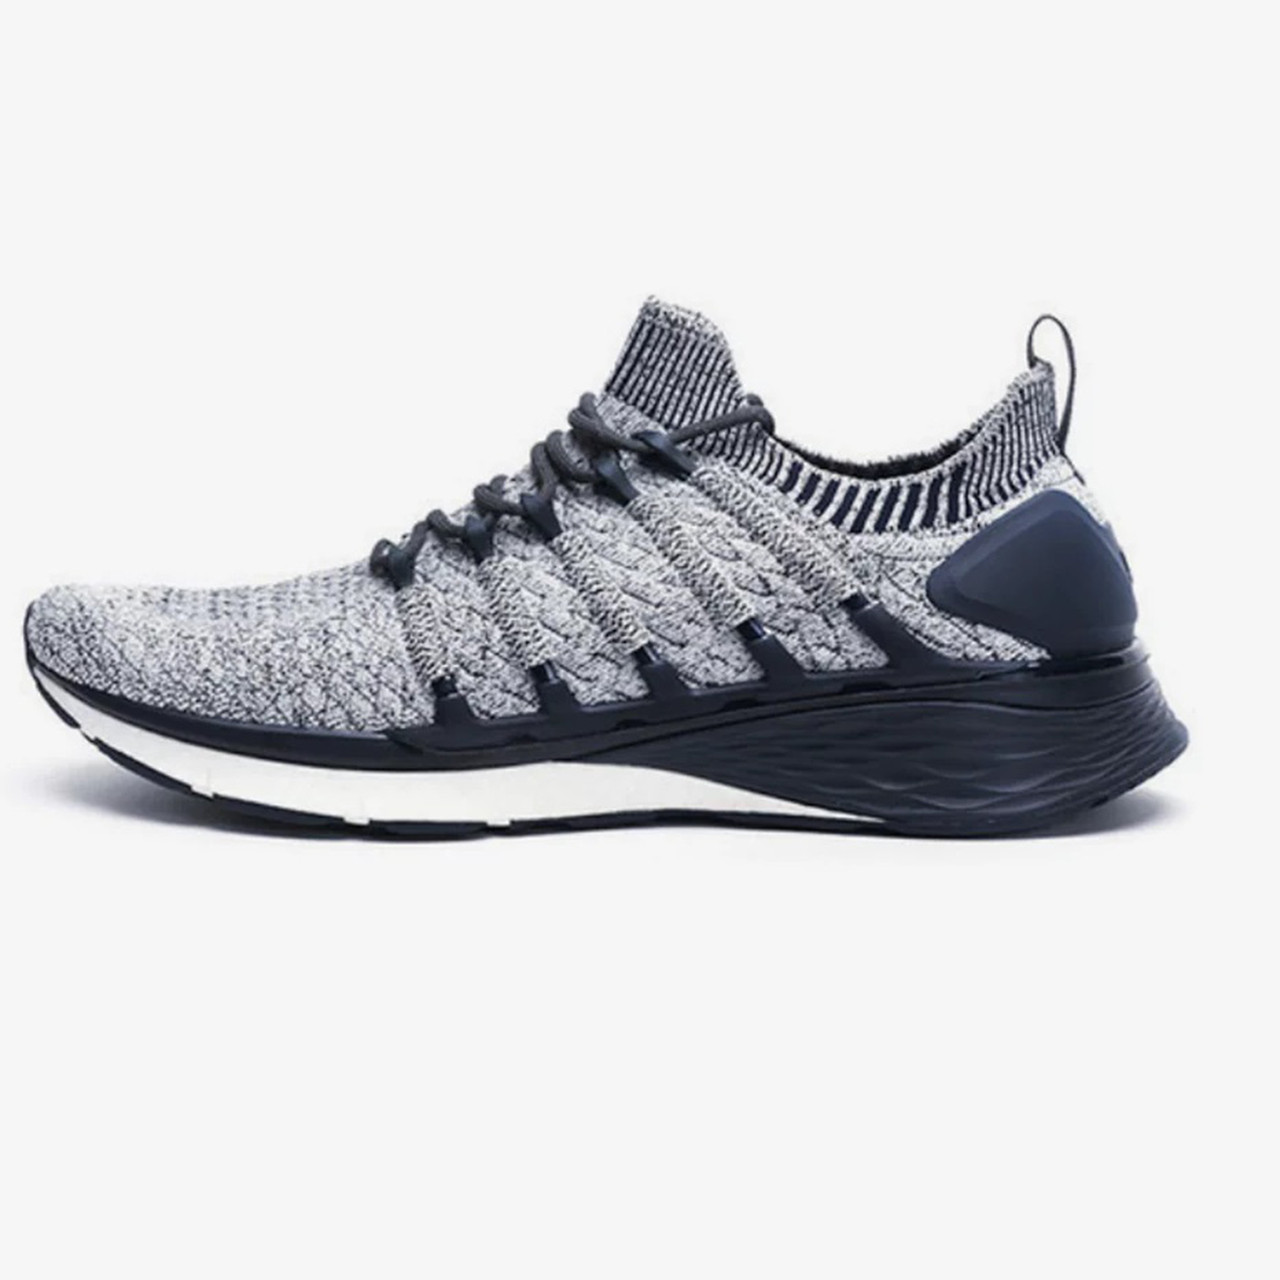 Кроссовки Xiaomi Mijia Sports Shoes 3 Gray Серые